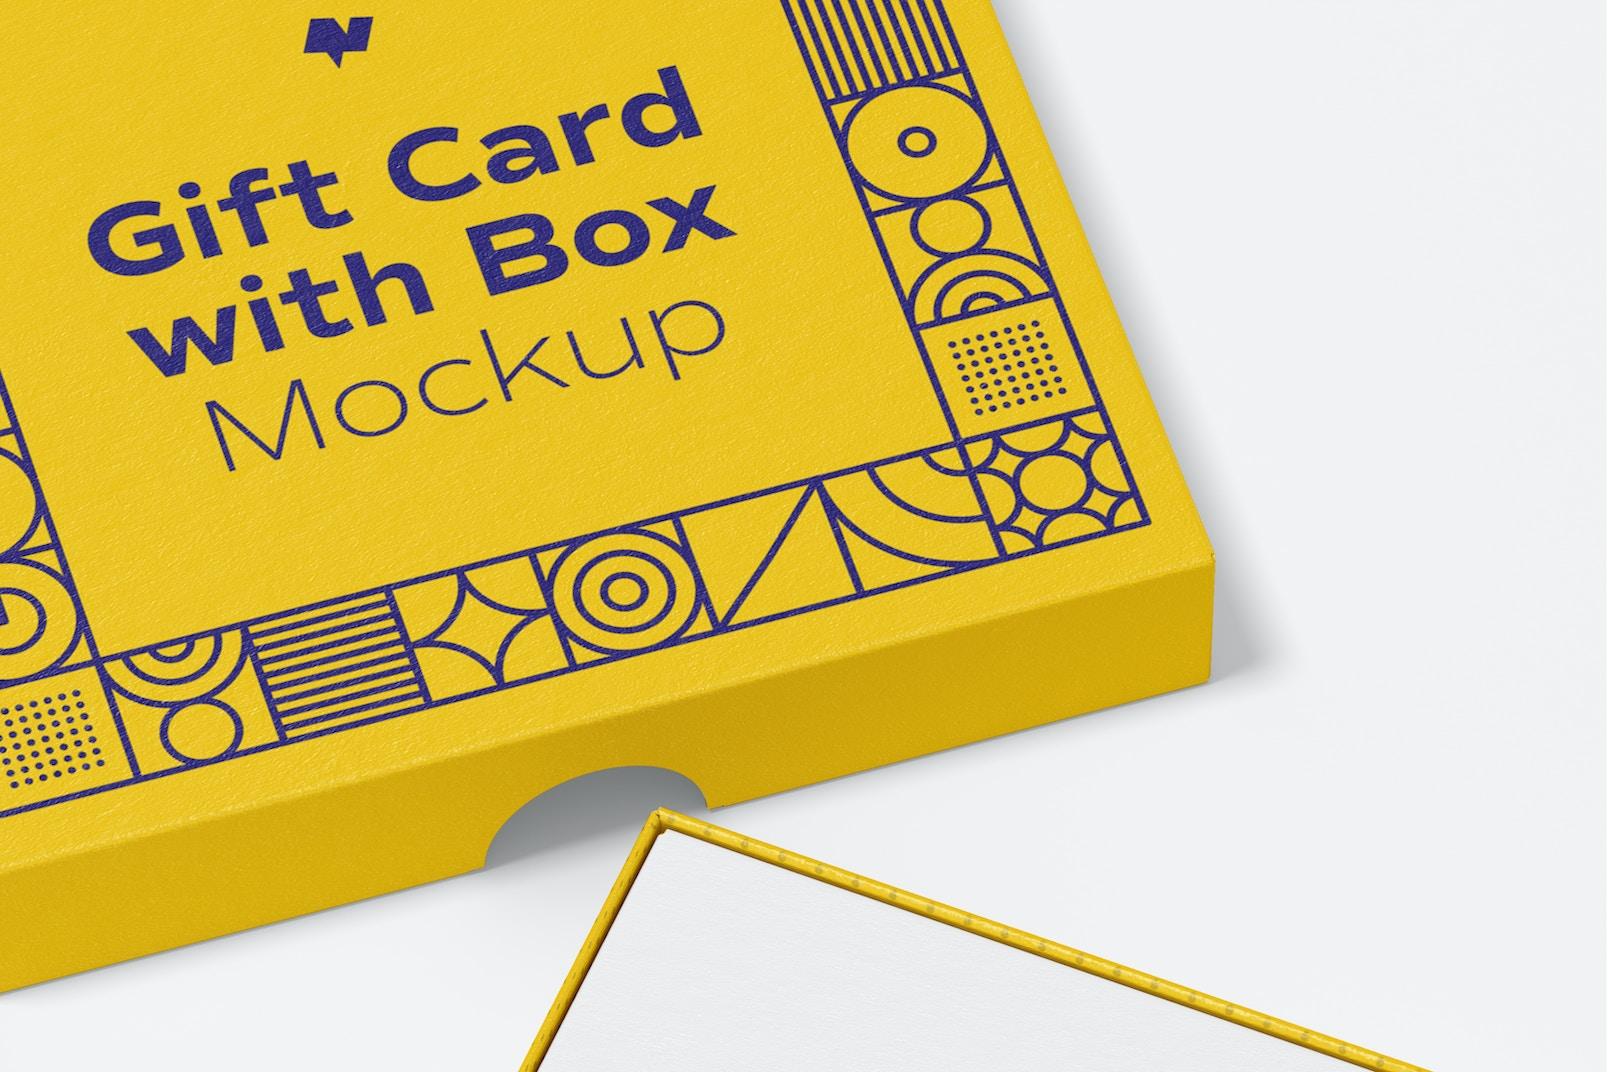 Gift Card with Box Mockup, Close-Up